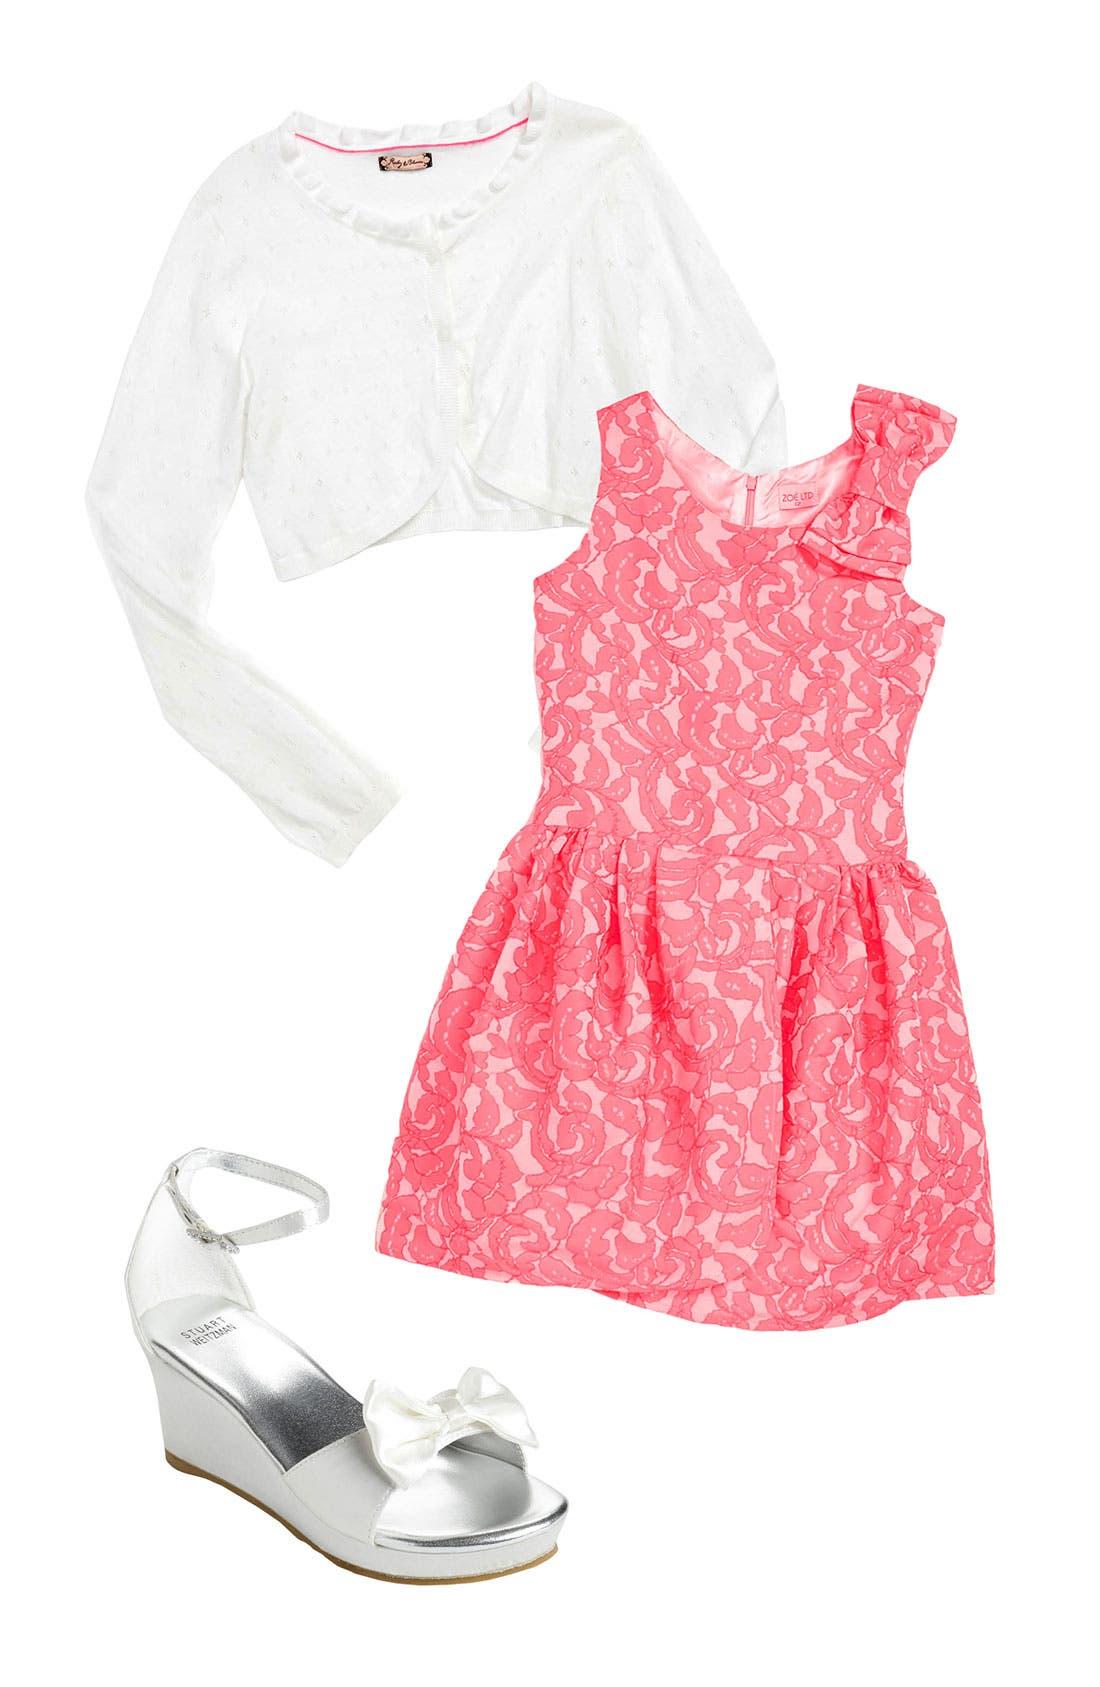 Alternate Image 1 Selected - Zoe Dress, Ruby & Bloom Bolero & Stuart Weitzman Sandal (Big Girls)